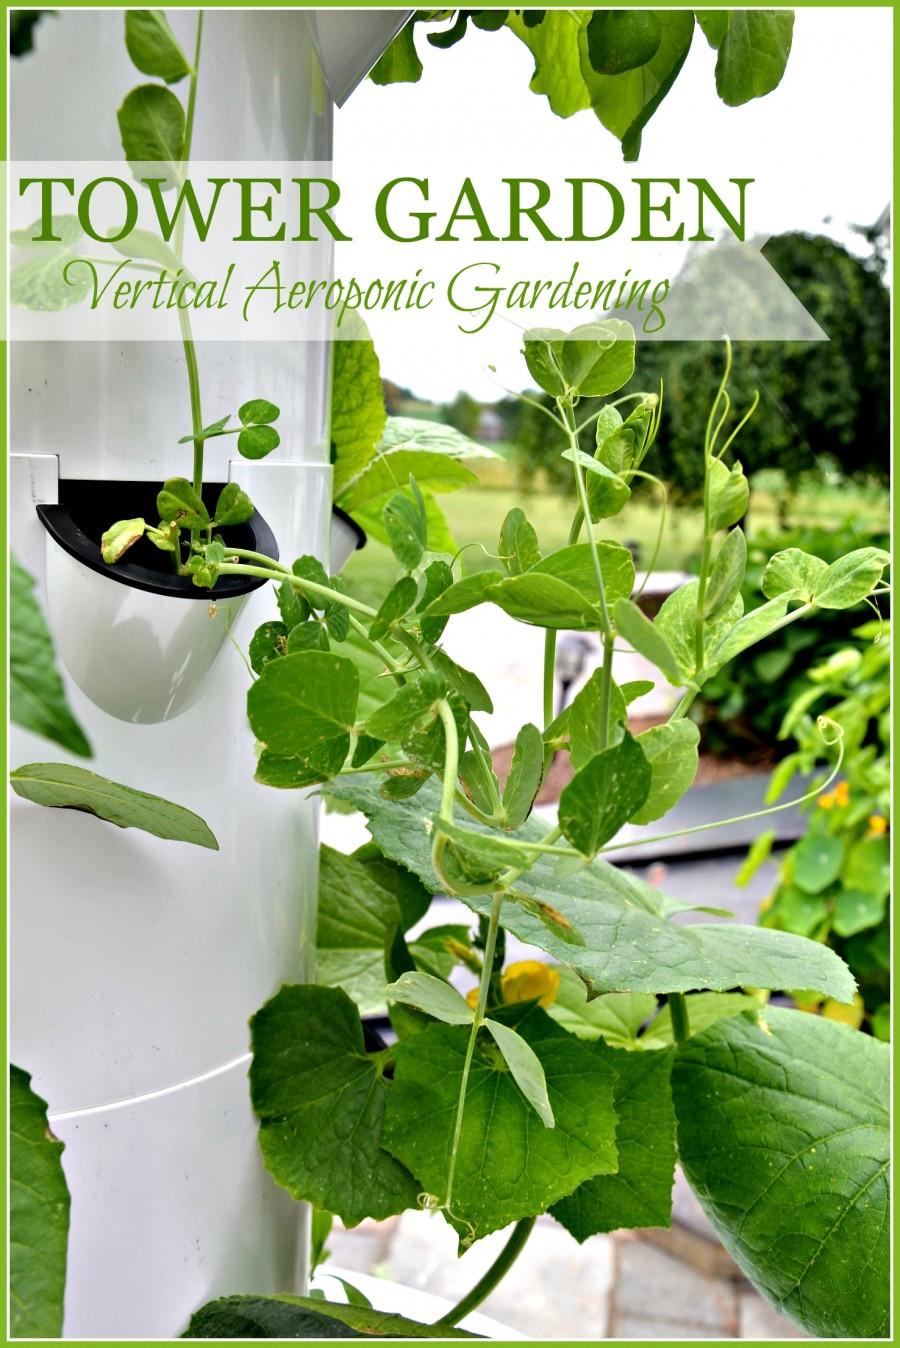 TOWER GARDEN- Aeroponic vertical gardening-stonegableblog.com